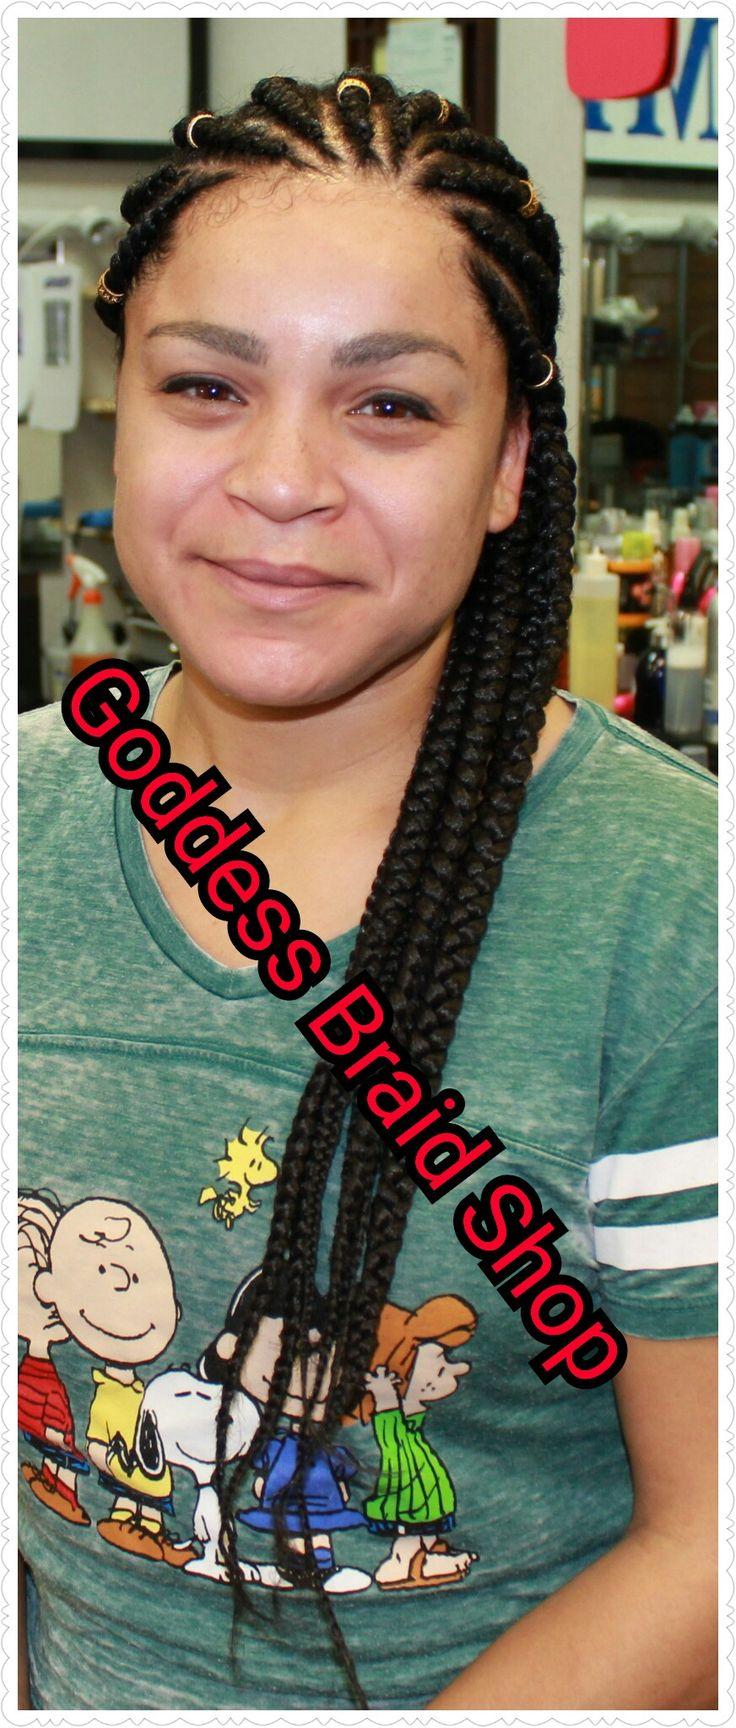 Cornrows at Goddess Braid Shop St Petersburg FL. www.goddessbraidshop.com. #drchele #goddessbraidshop #hcpoils #cornrows #crochetbraids #naturalhair #naturalhaircommunity #braiding #braidideas #stpetersburgfl #tampa #kinkycurly #curlyhairdontcare